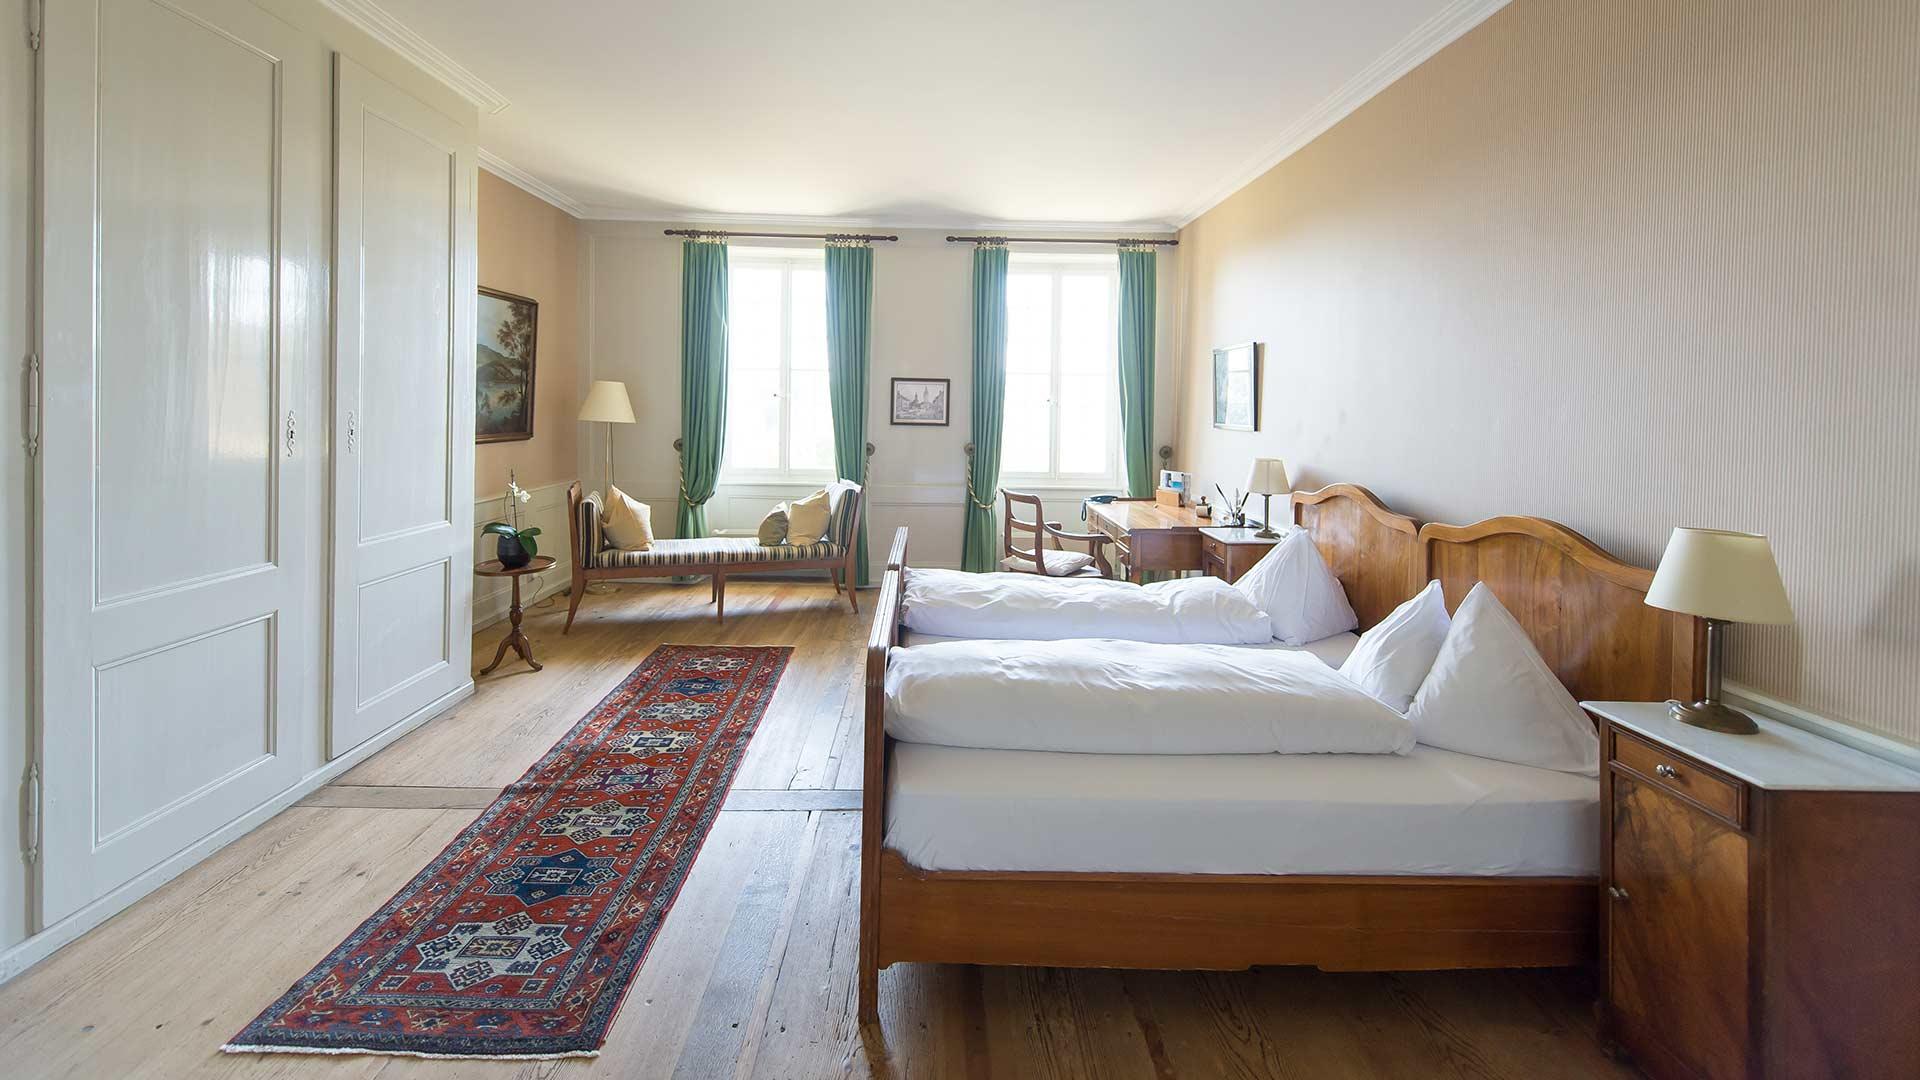 Historisches Zimmer St.Petersinsel